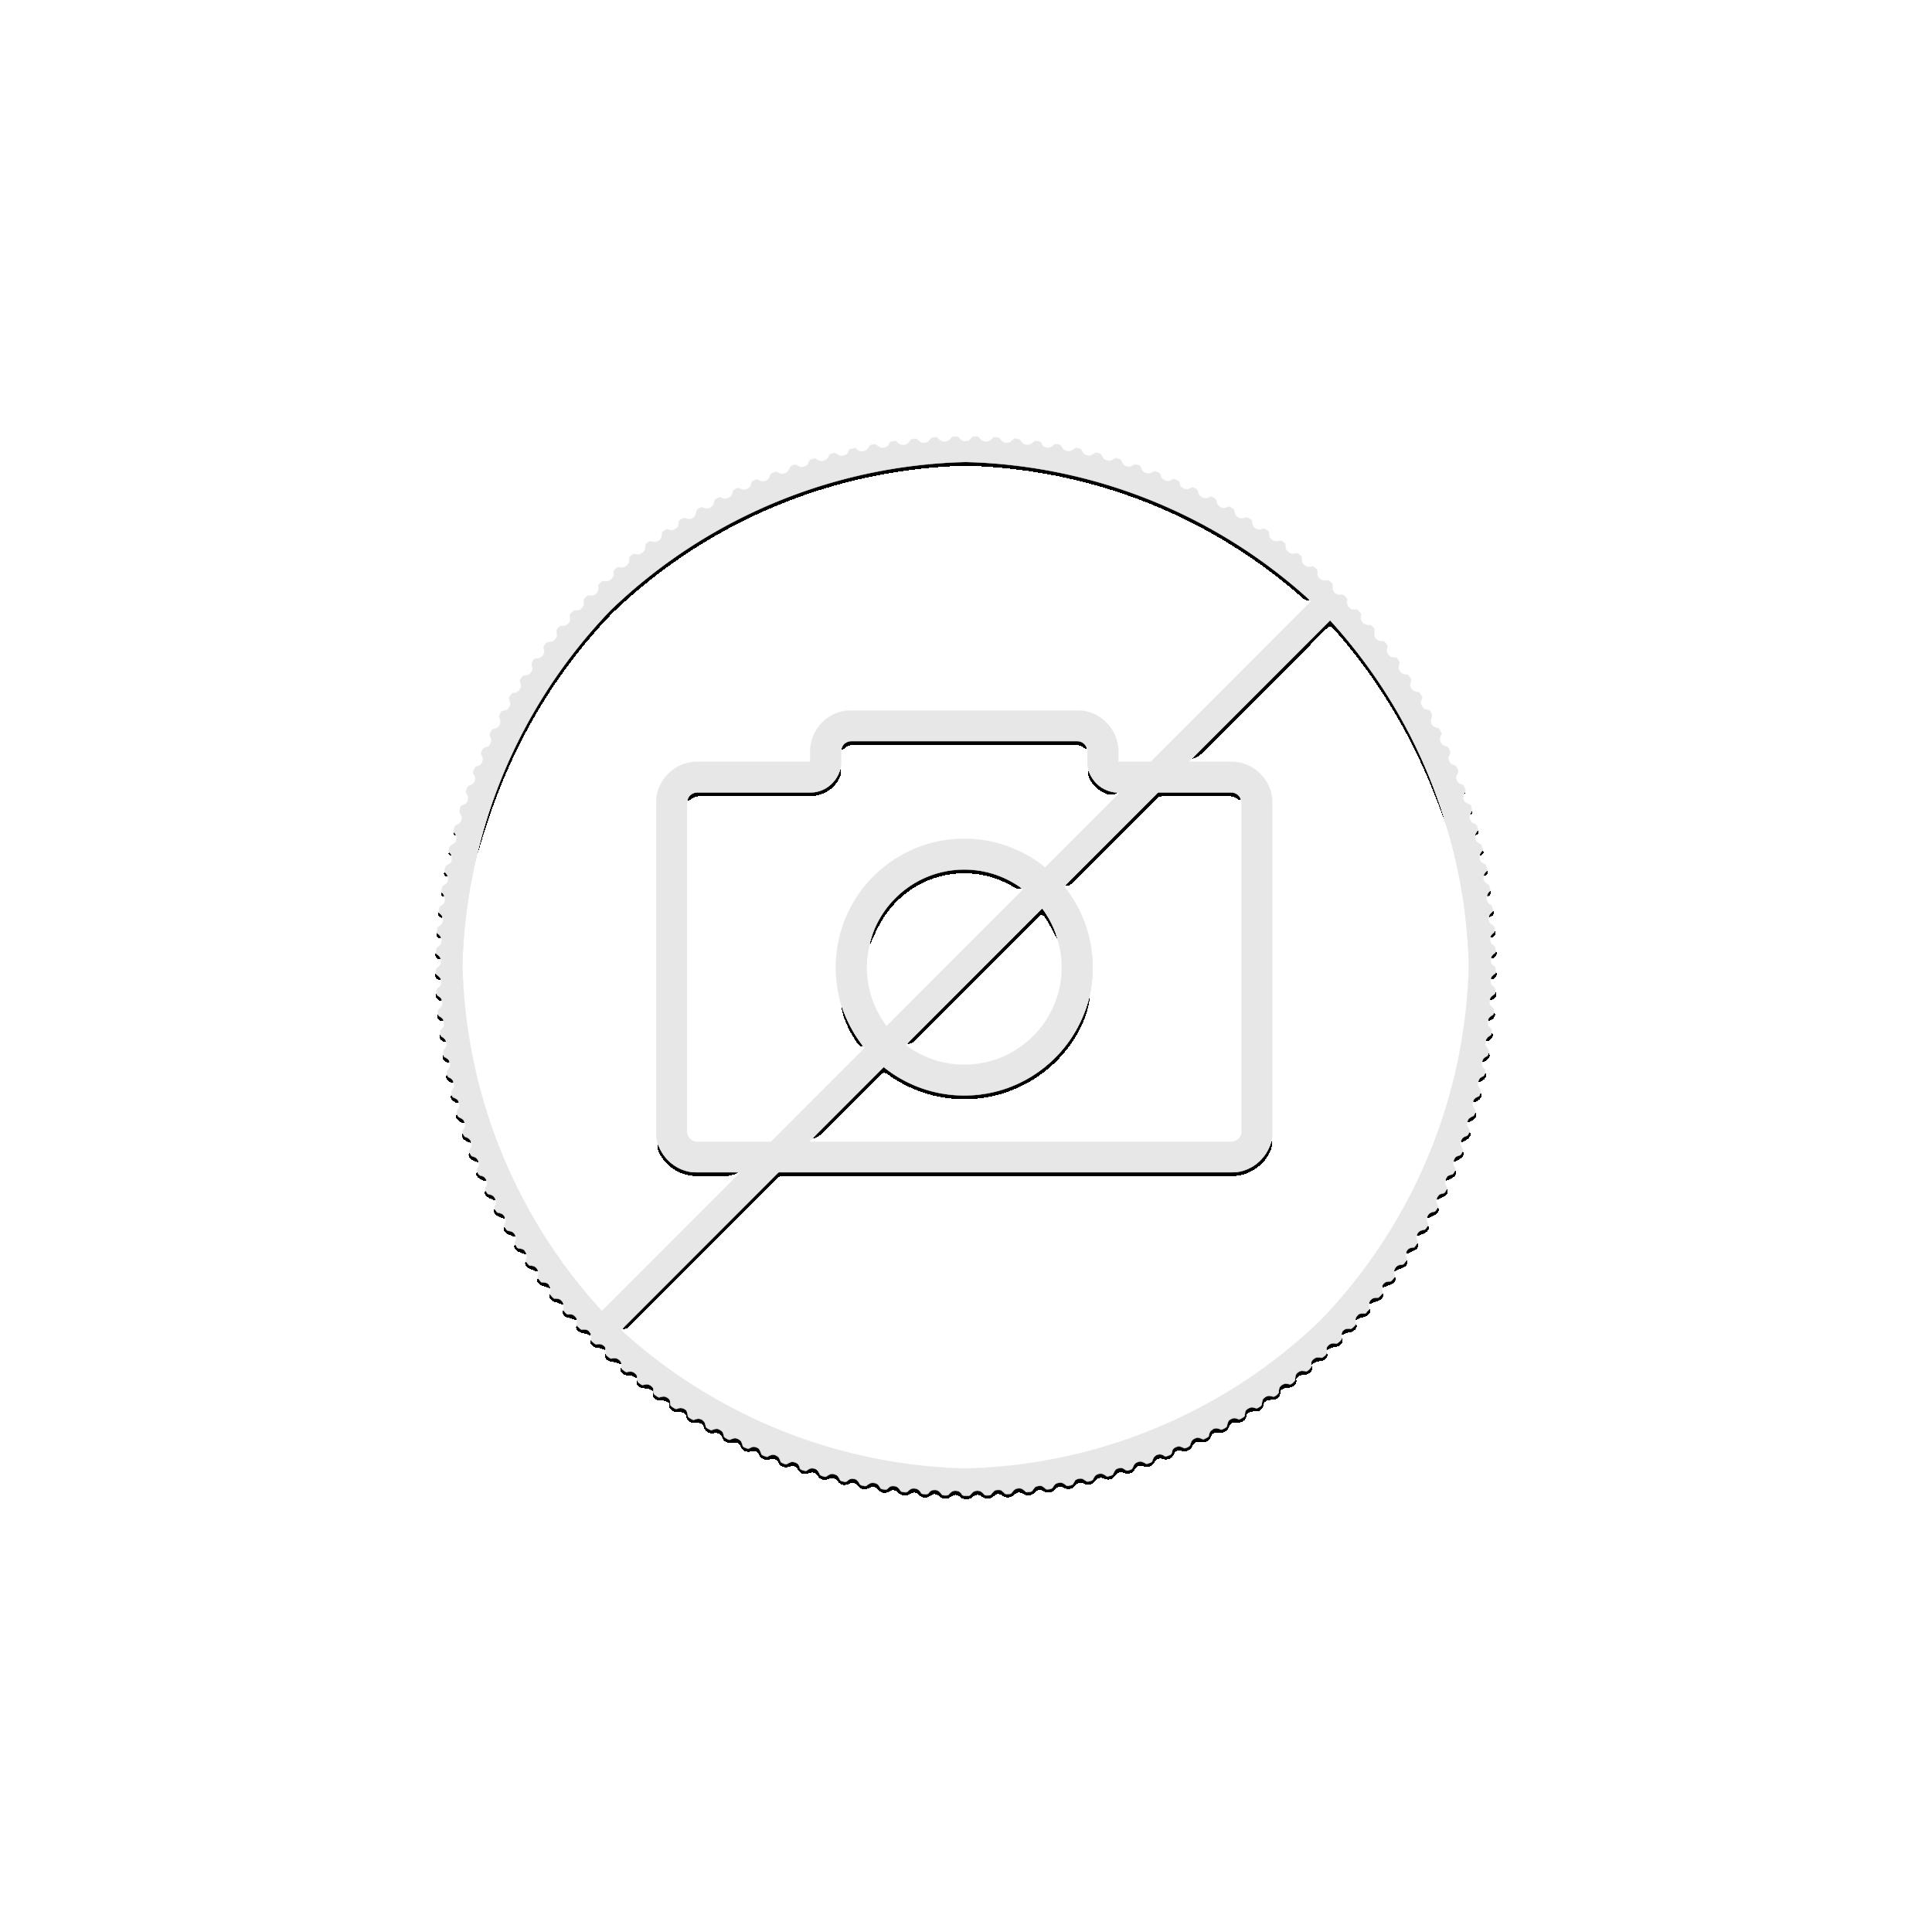 1 Troy ounce silver coin Koala 2019